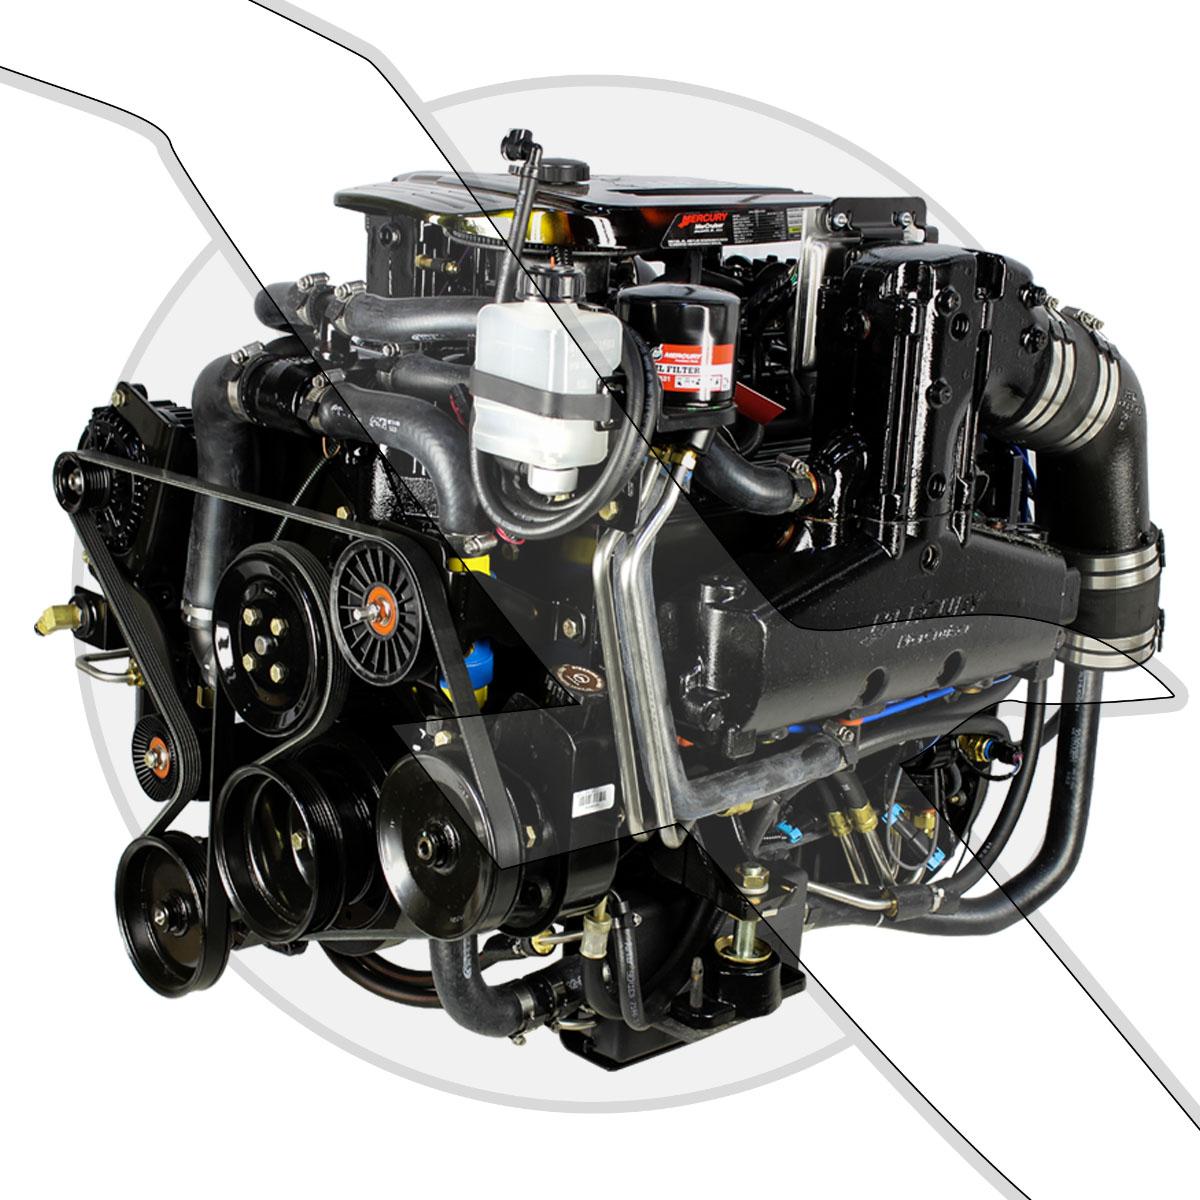 Mercruiser 383ci 6 3l Mpi Stroker Bravo Engine Only Marine